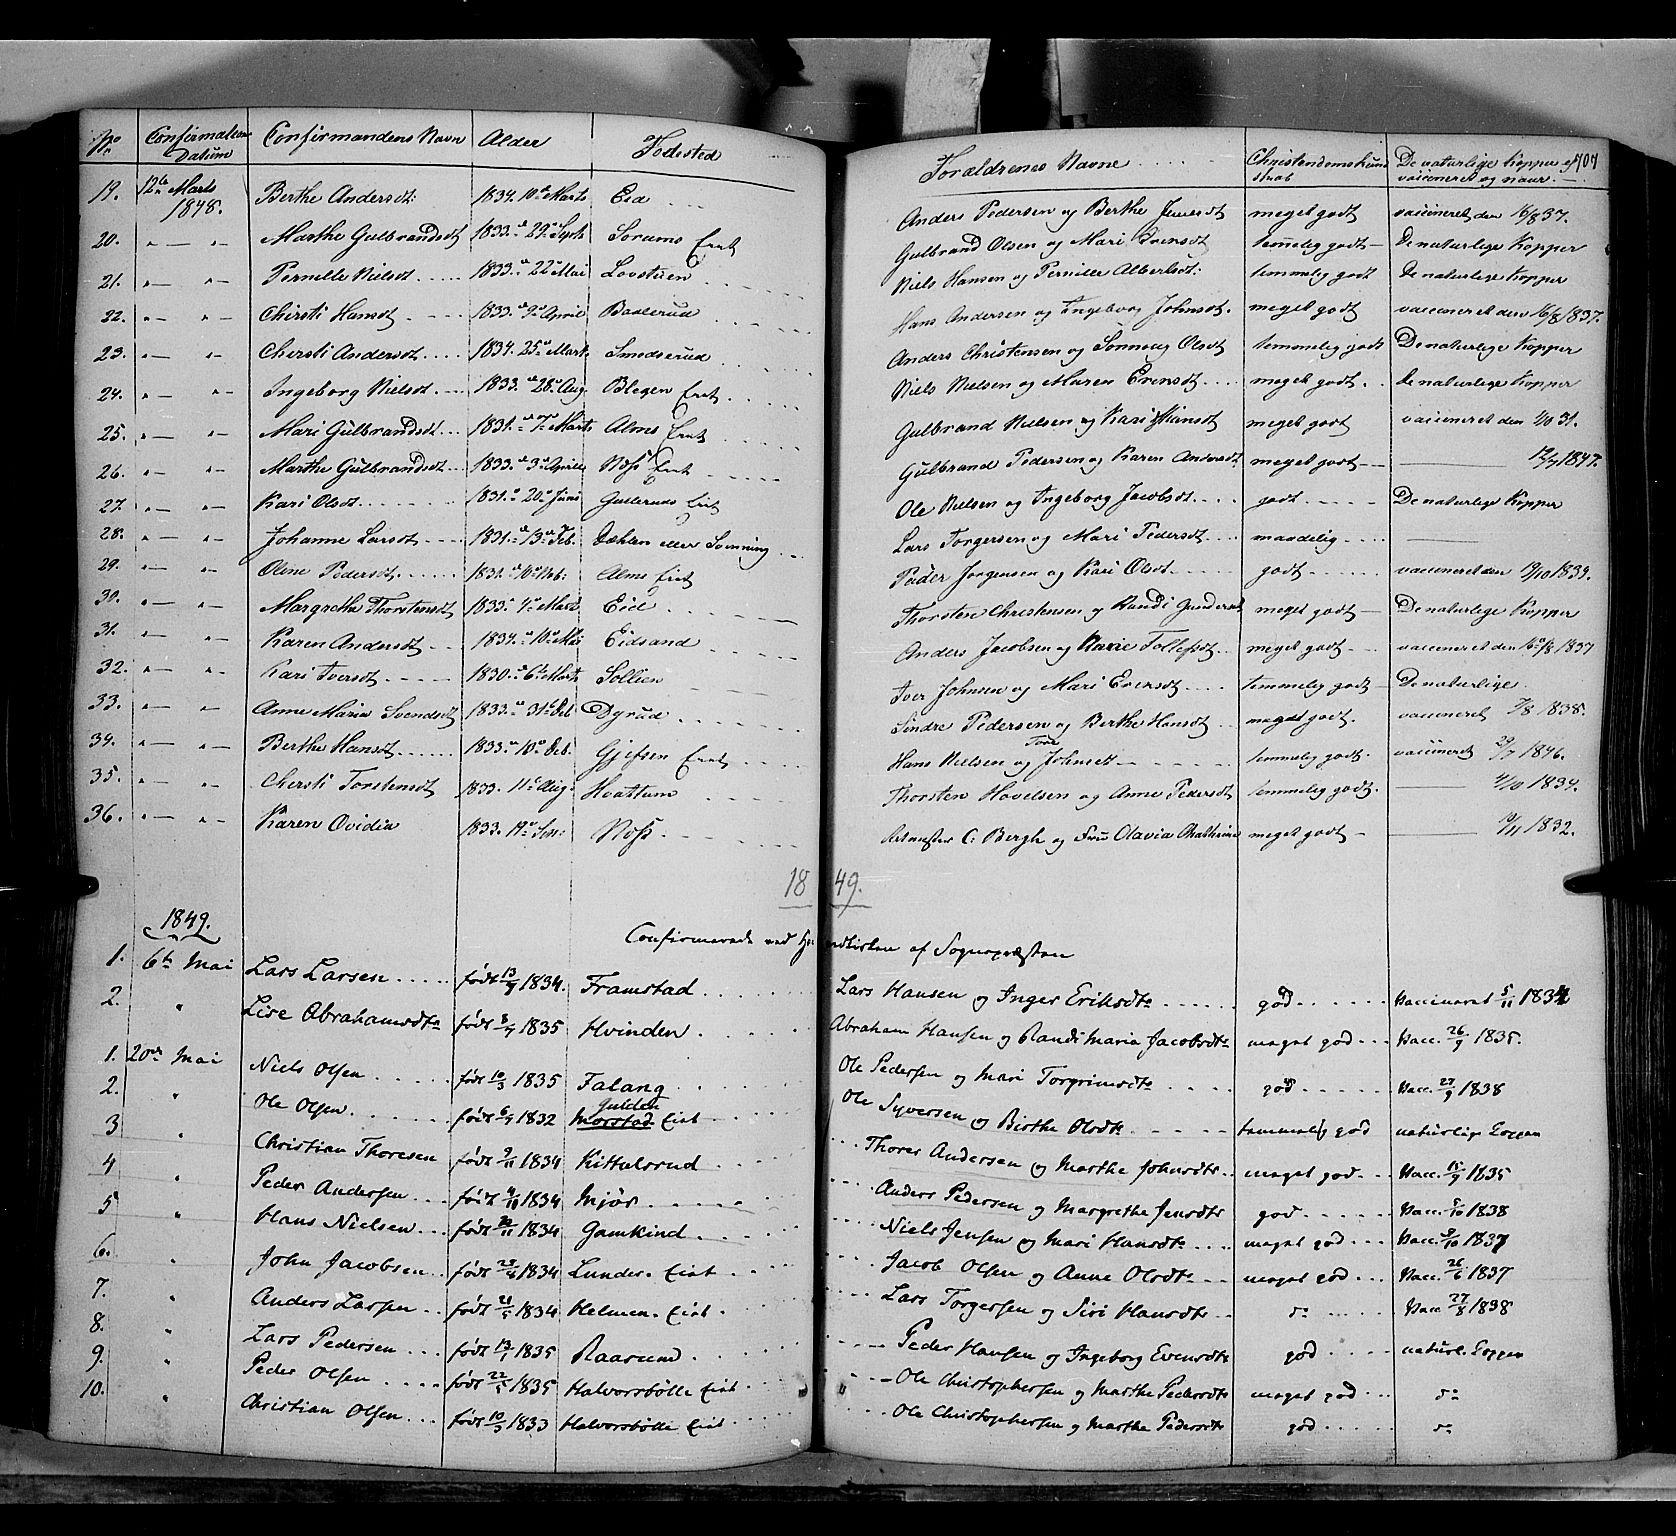 SAH, Gran prestekontor, Ministerialbok nr. 11, 1842-1856, s. 706-707